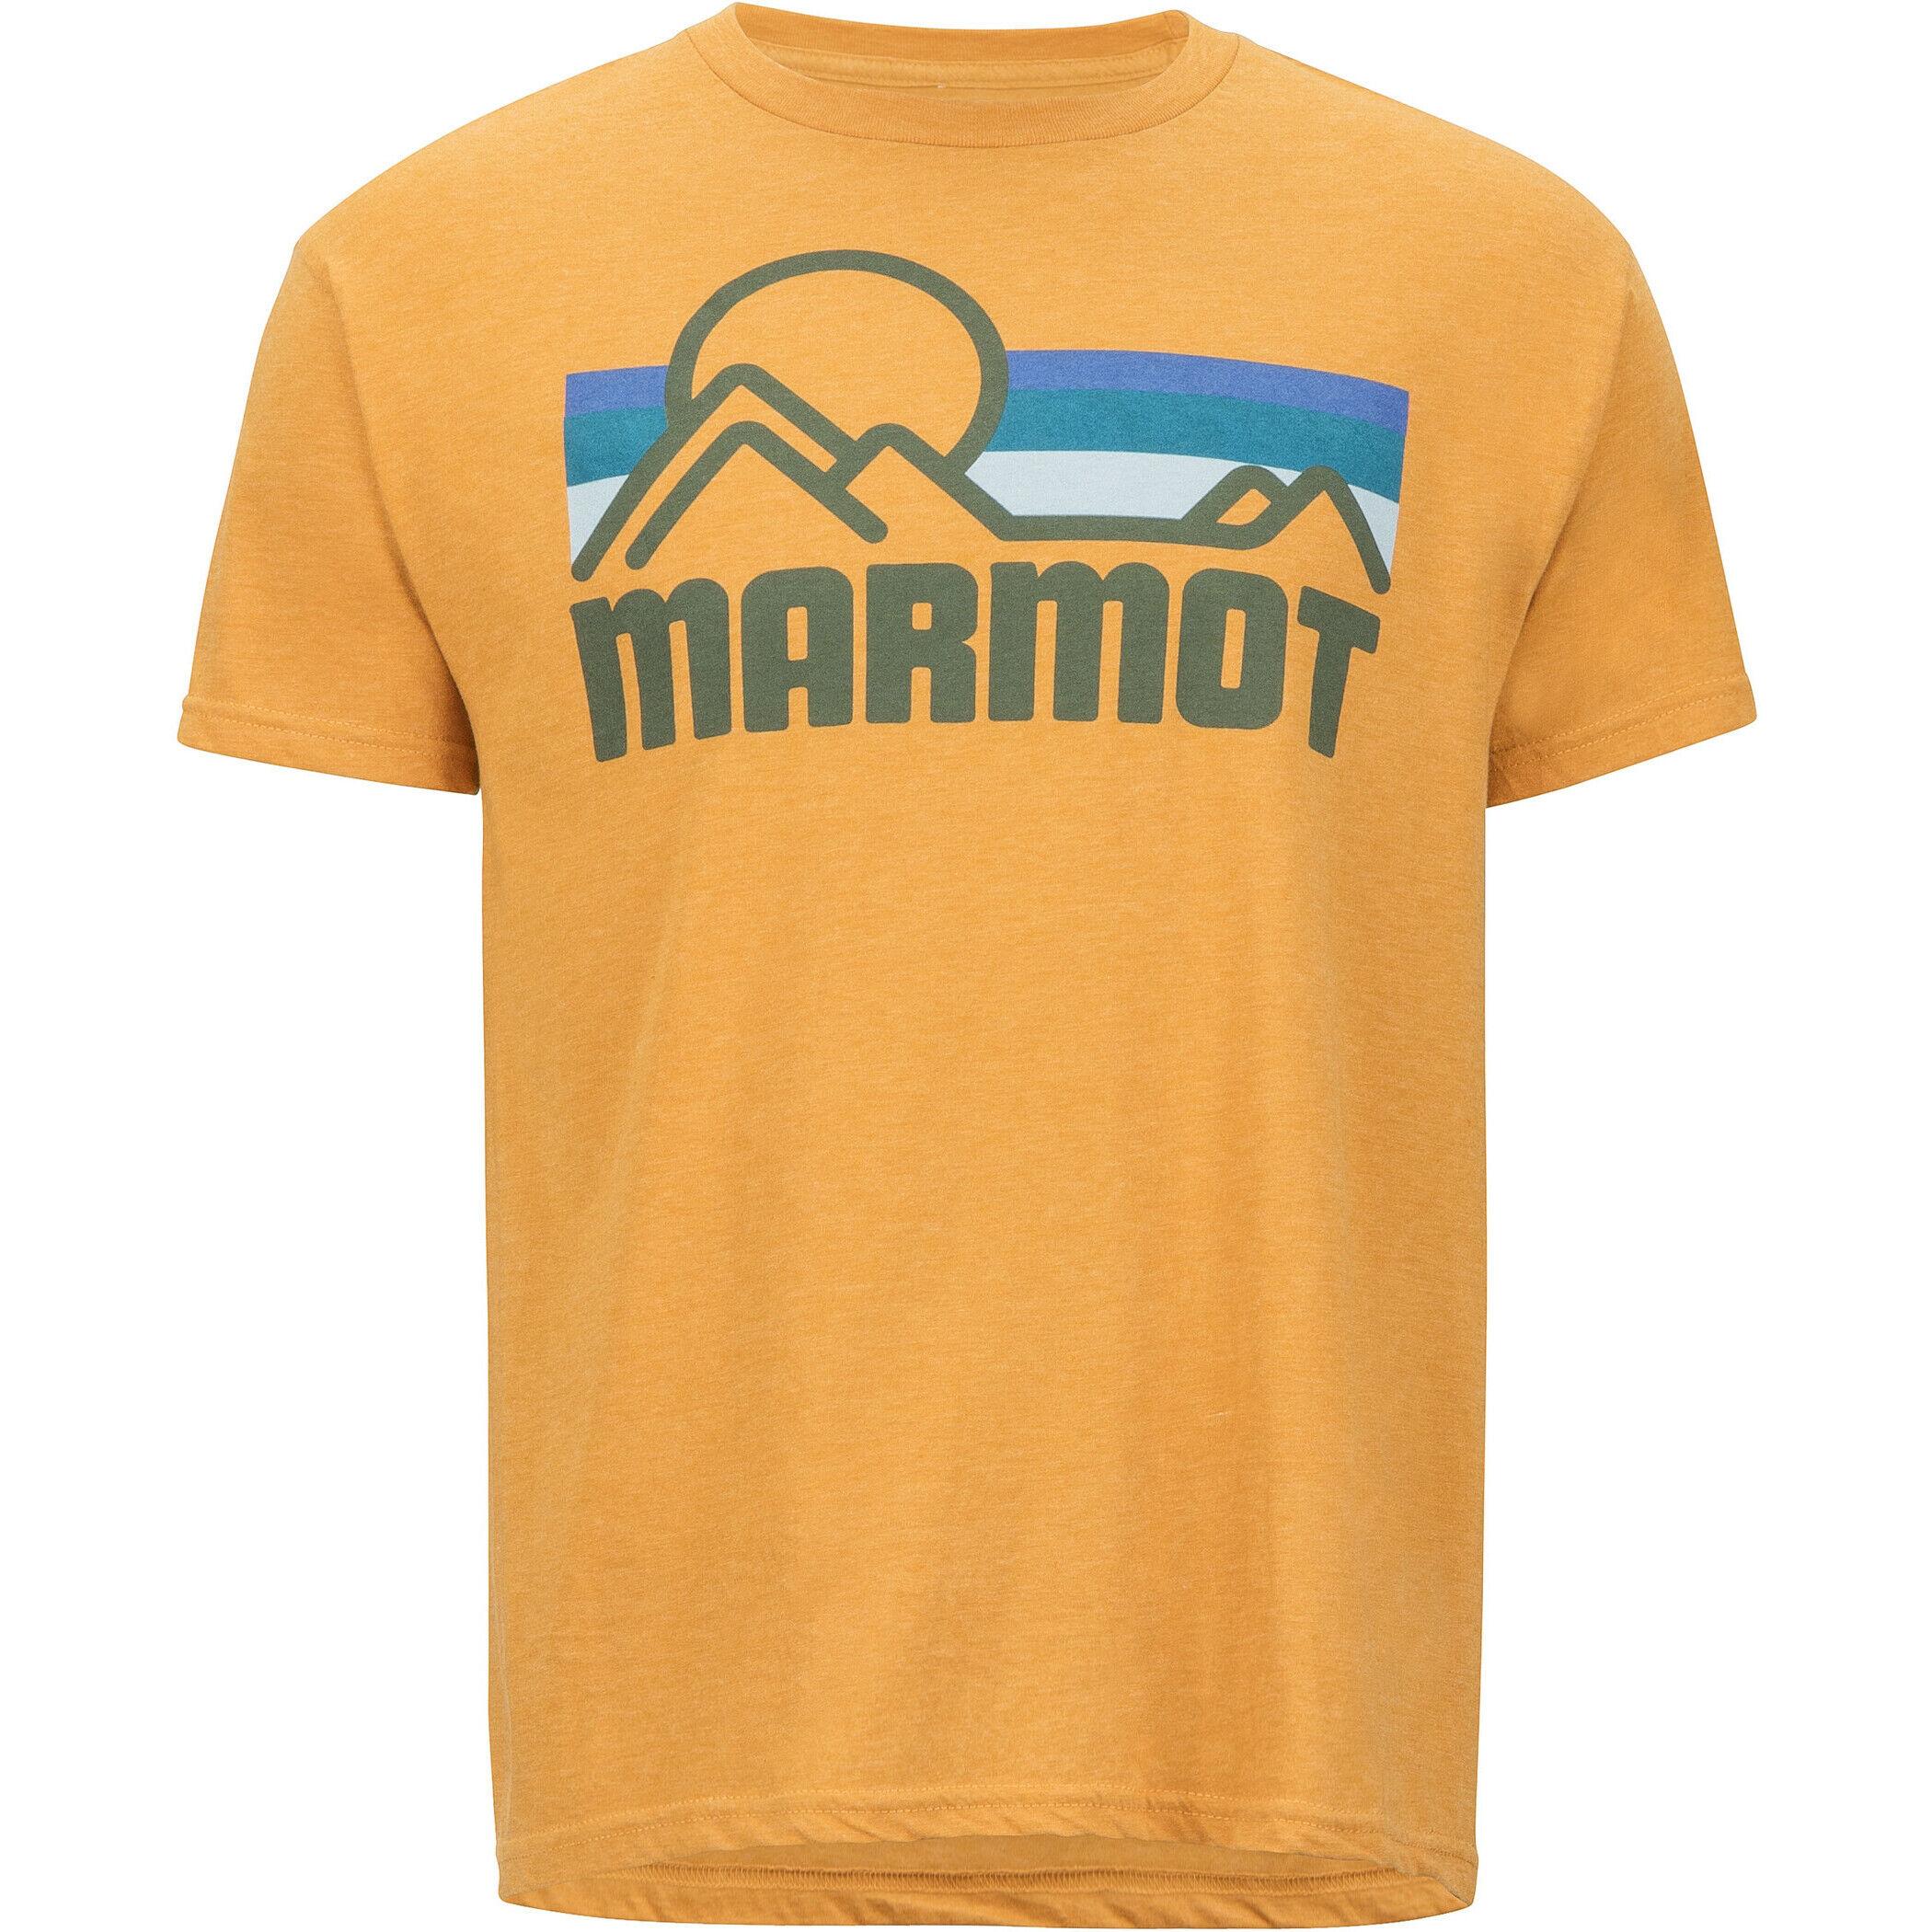 Marmot Rey Knolls Kurzarm T-Shirt Herren Charcoal Heather 2019 Kurzarmshirt